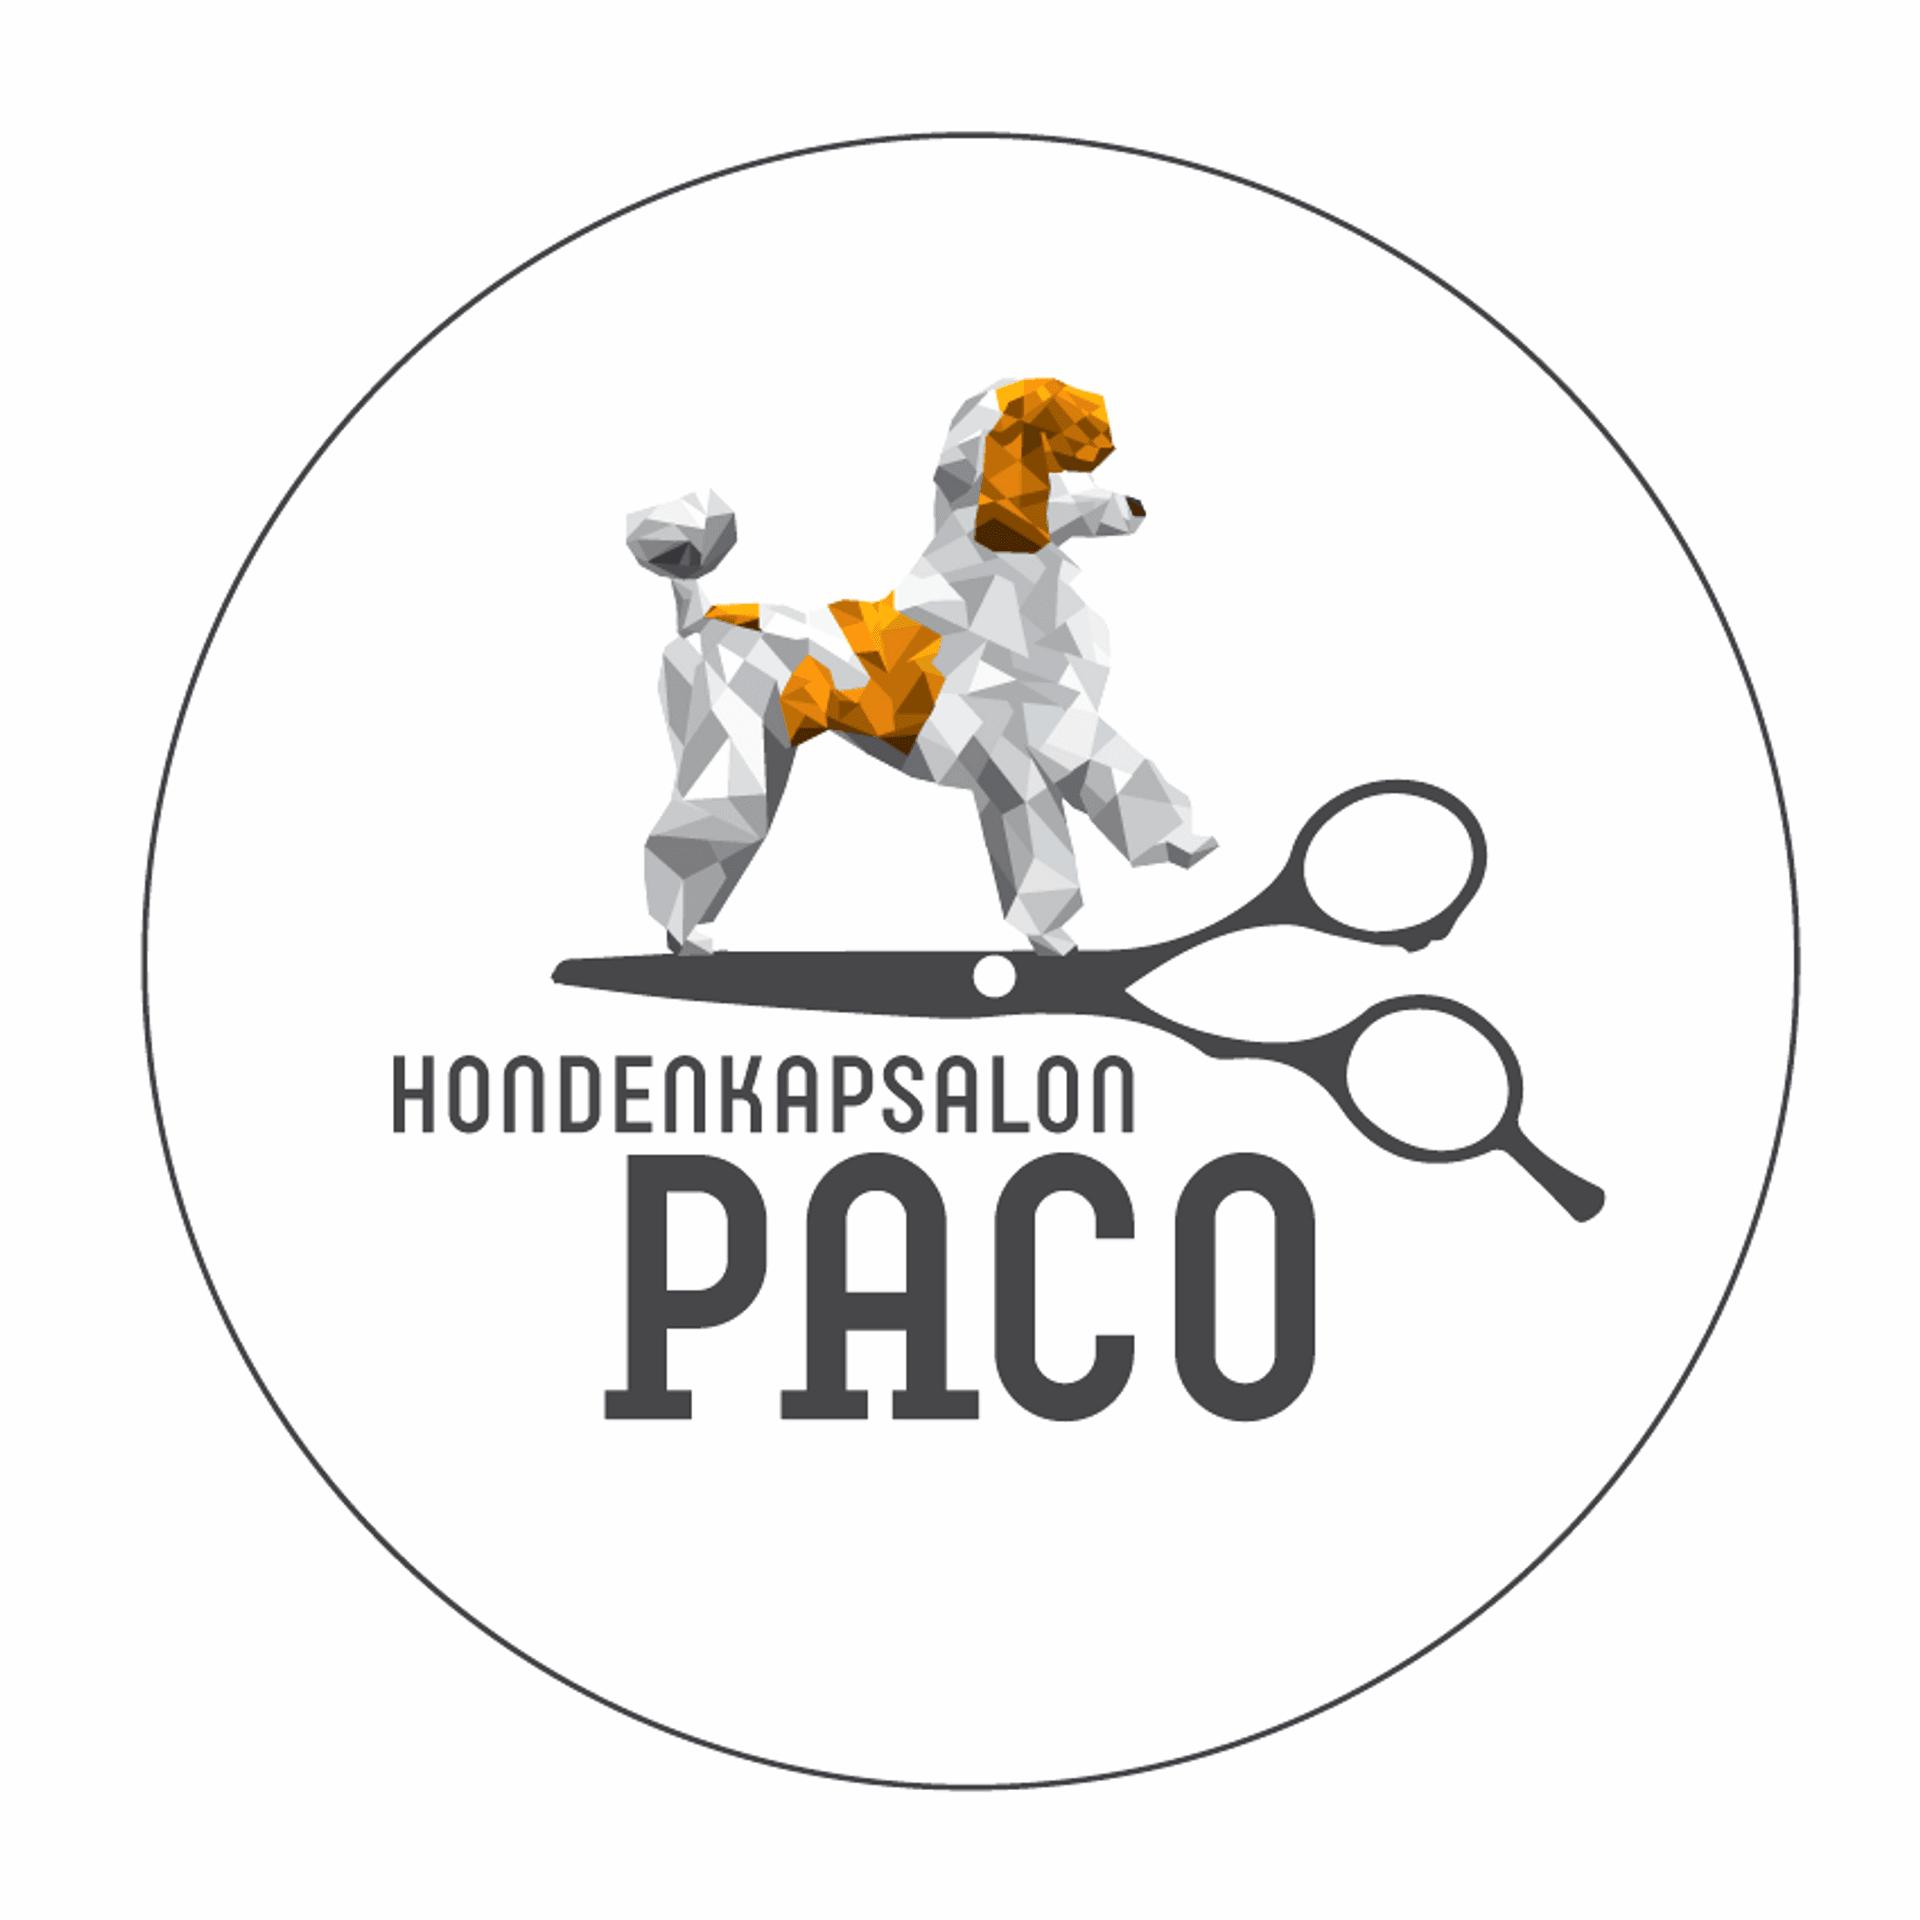 Hondenkapsalon Paco